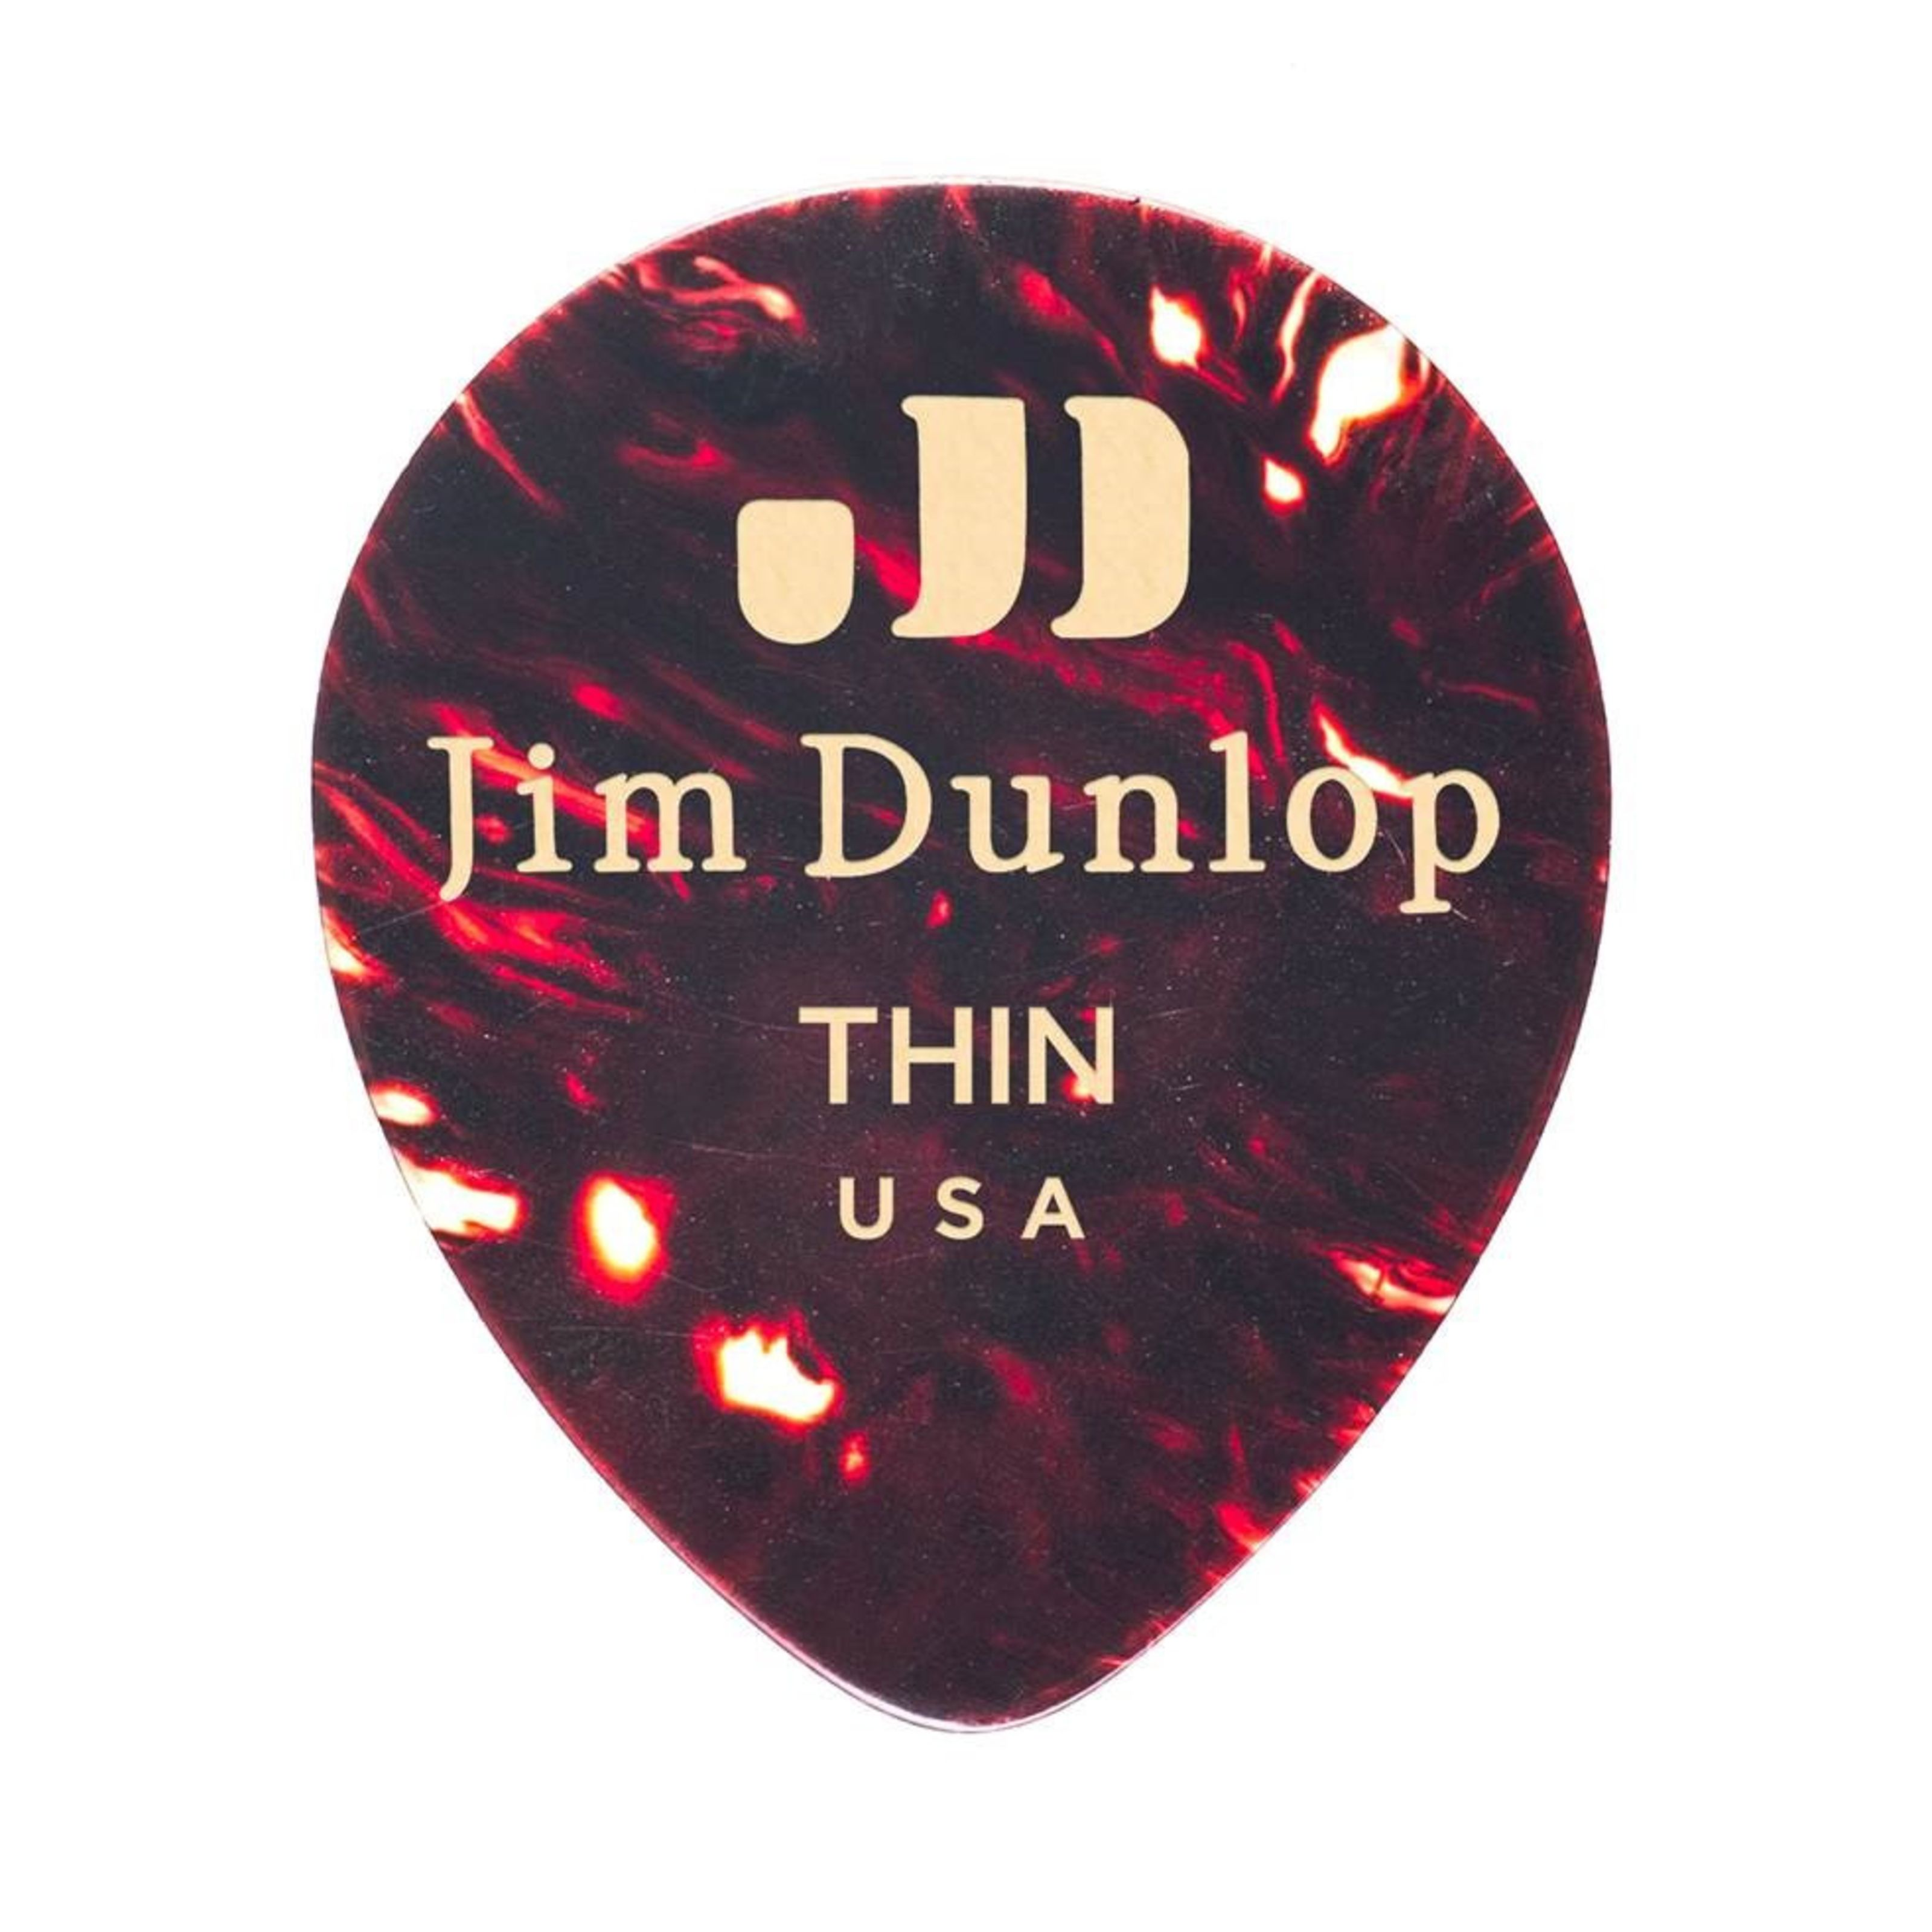 Dunlop - Teardrop 485 Picks DL P 0107 485P05 TH